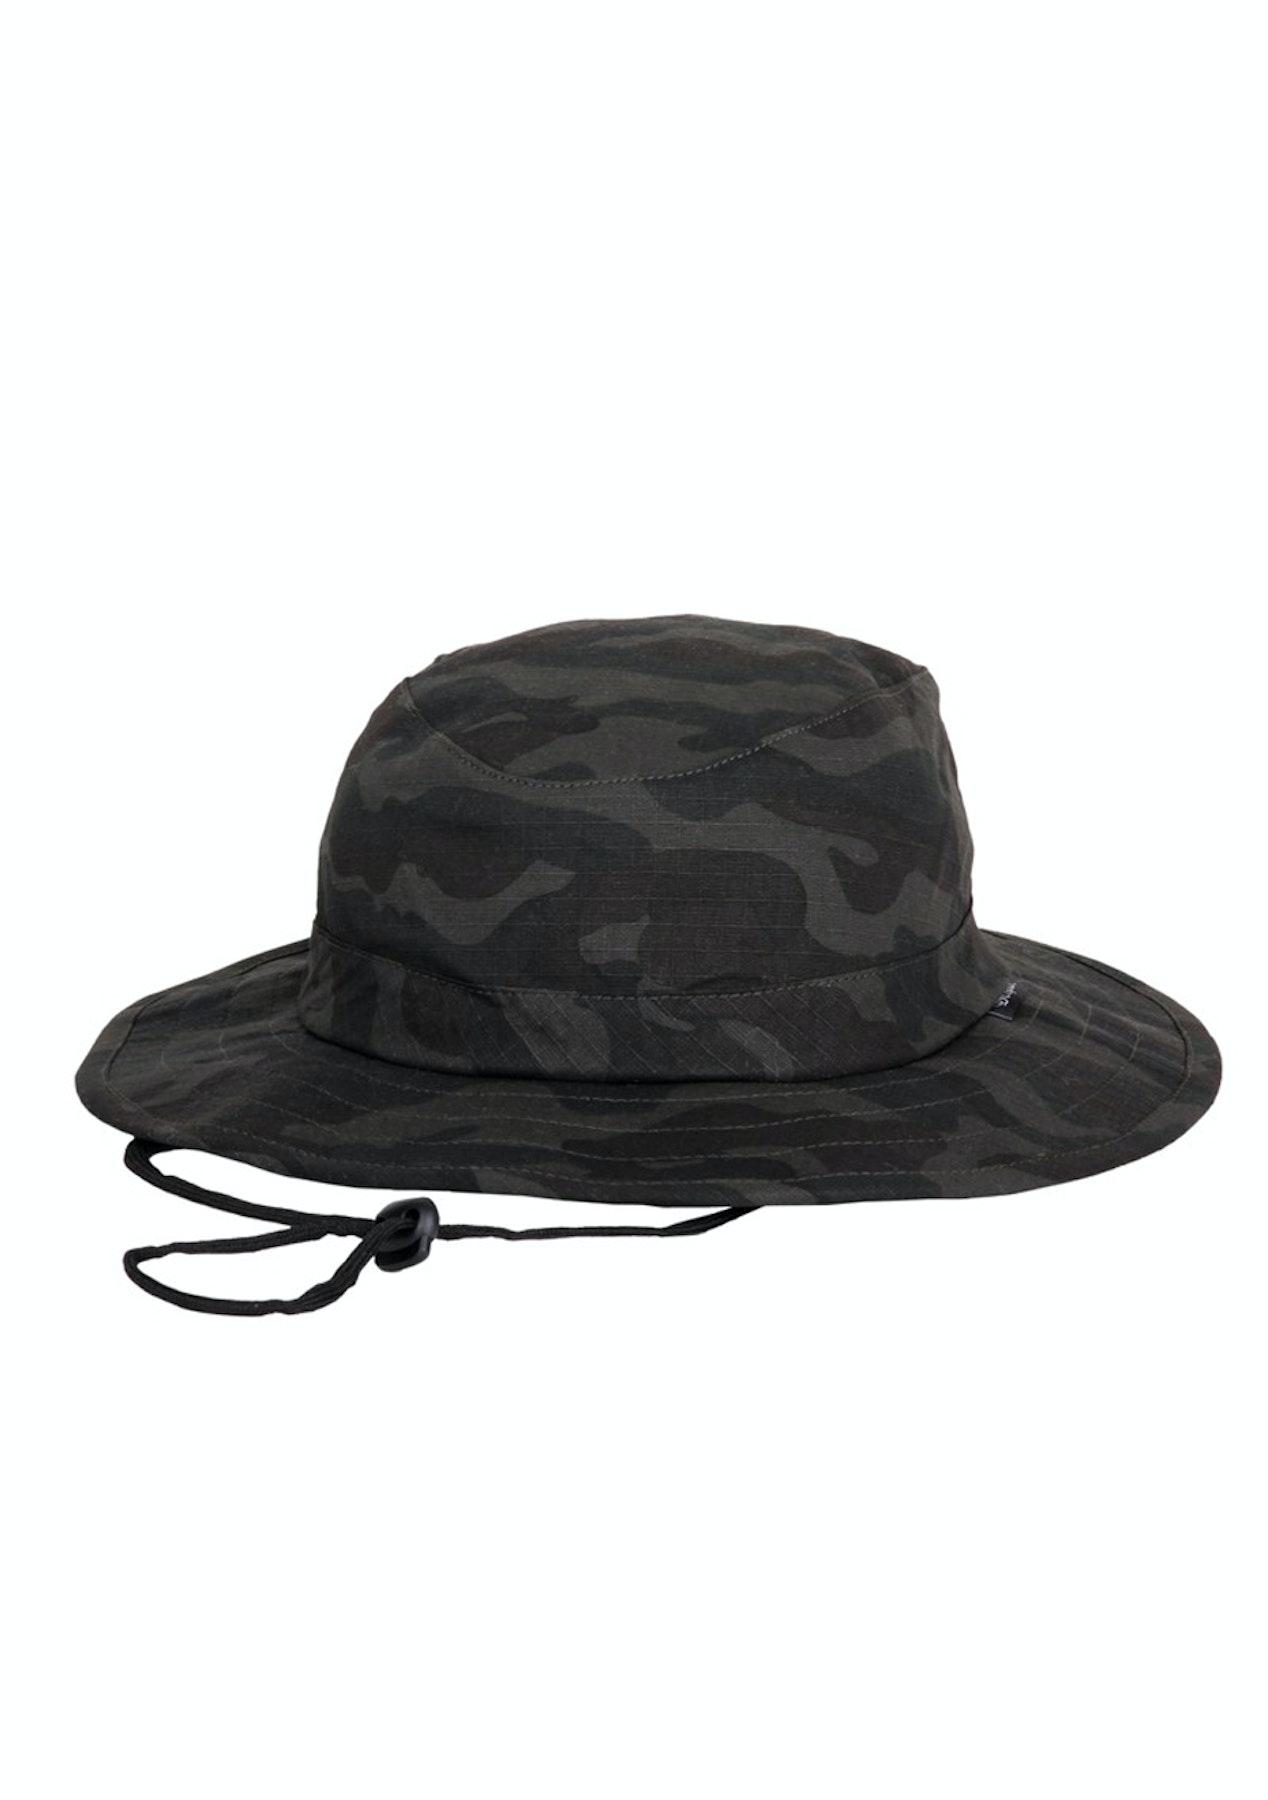 b51be1d4ab9 Brixton - Tracker Bucket Hat - Mens Streetwear Sale - Onceit